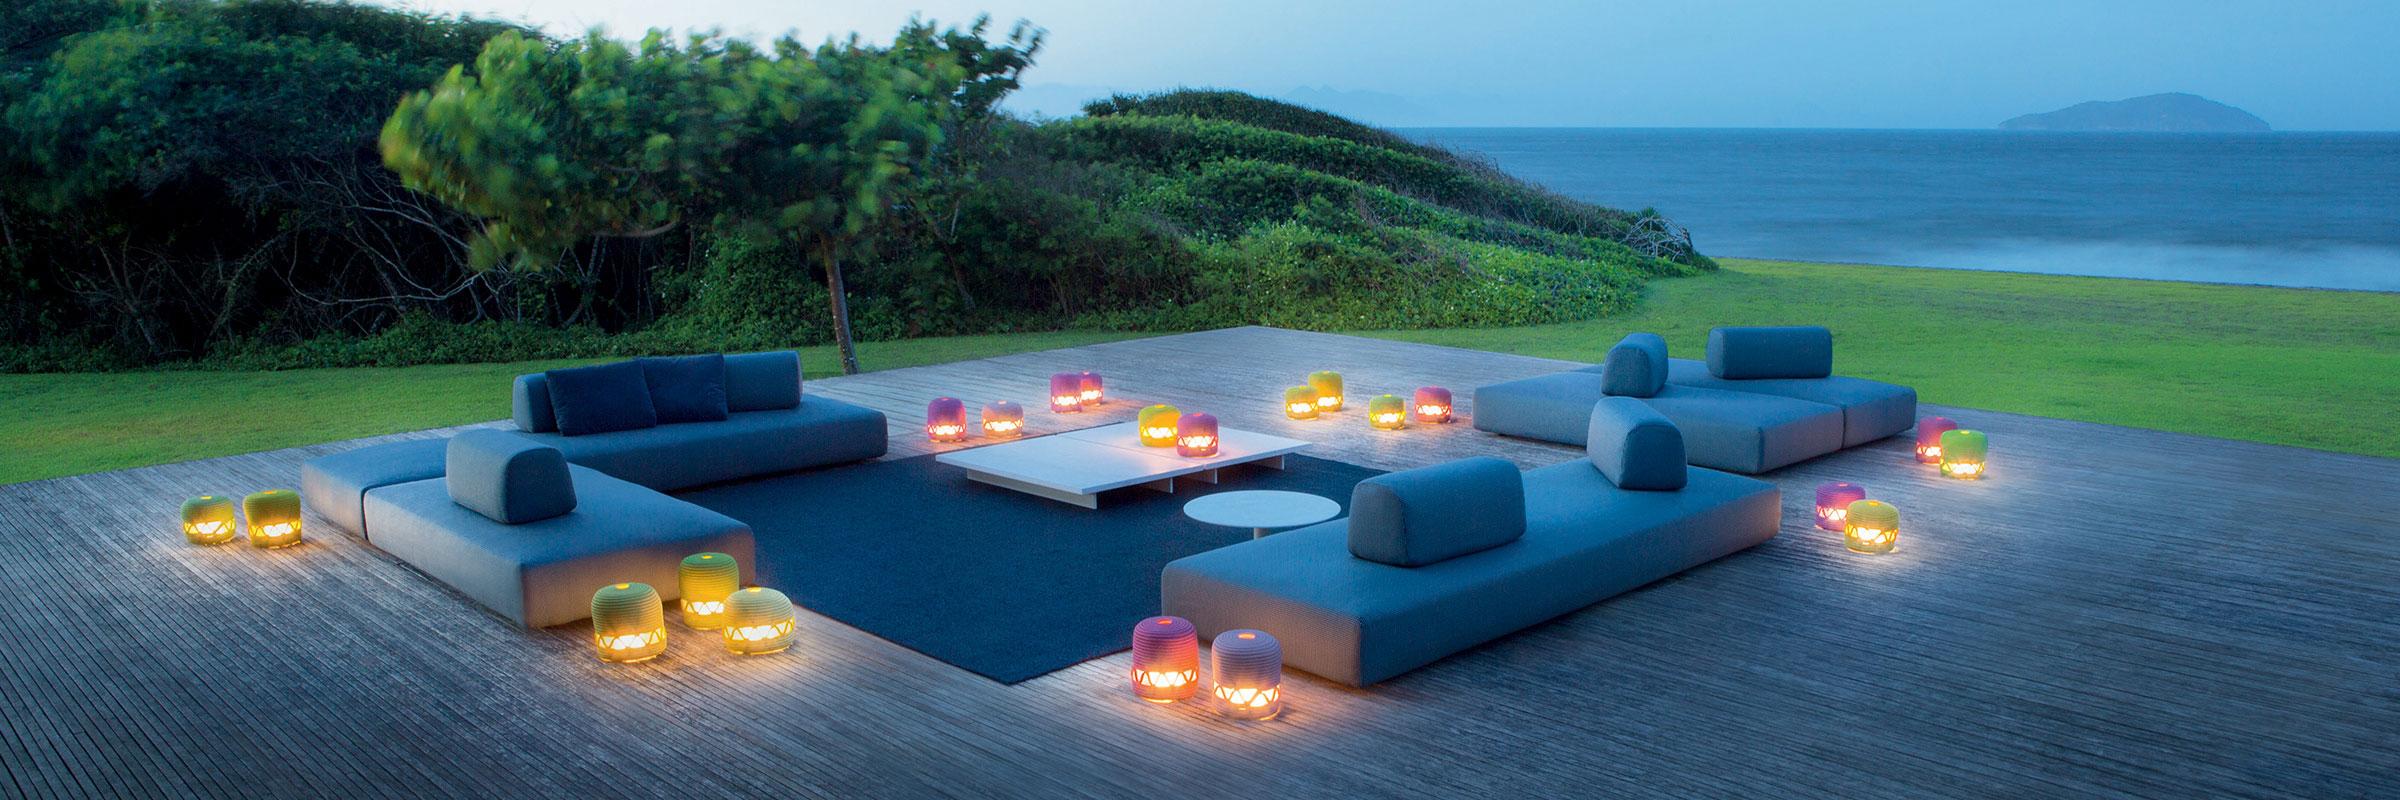 hauser-design-paola-lenti-sofa-orlando-bei-abendstimmung